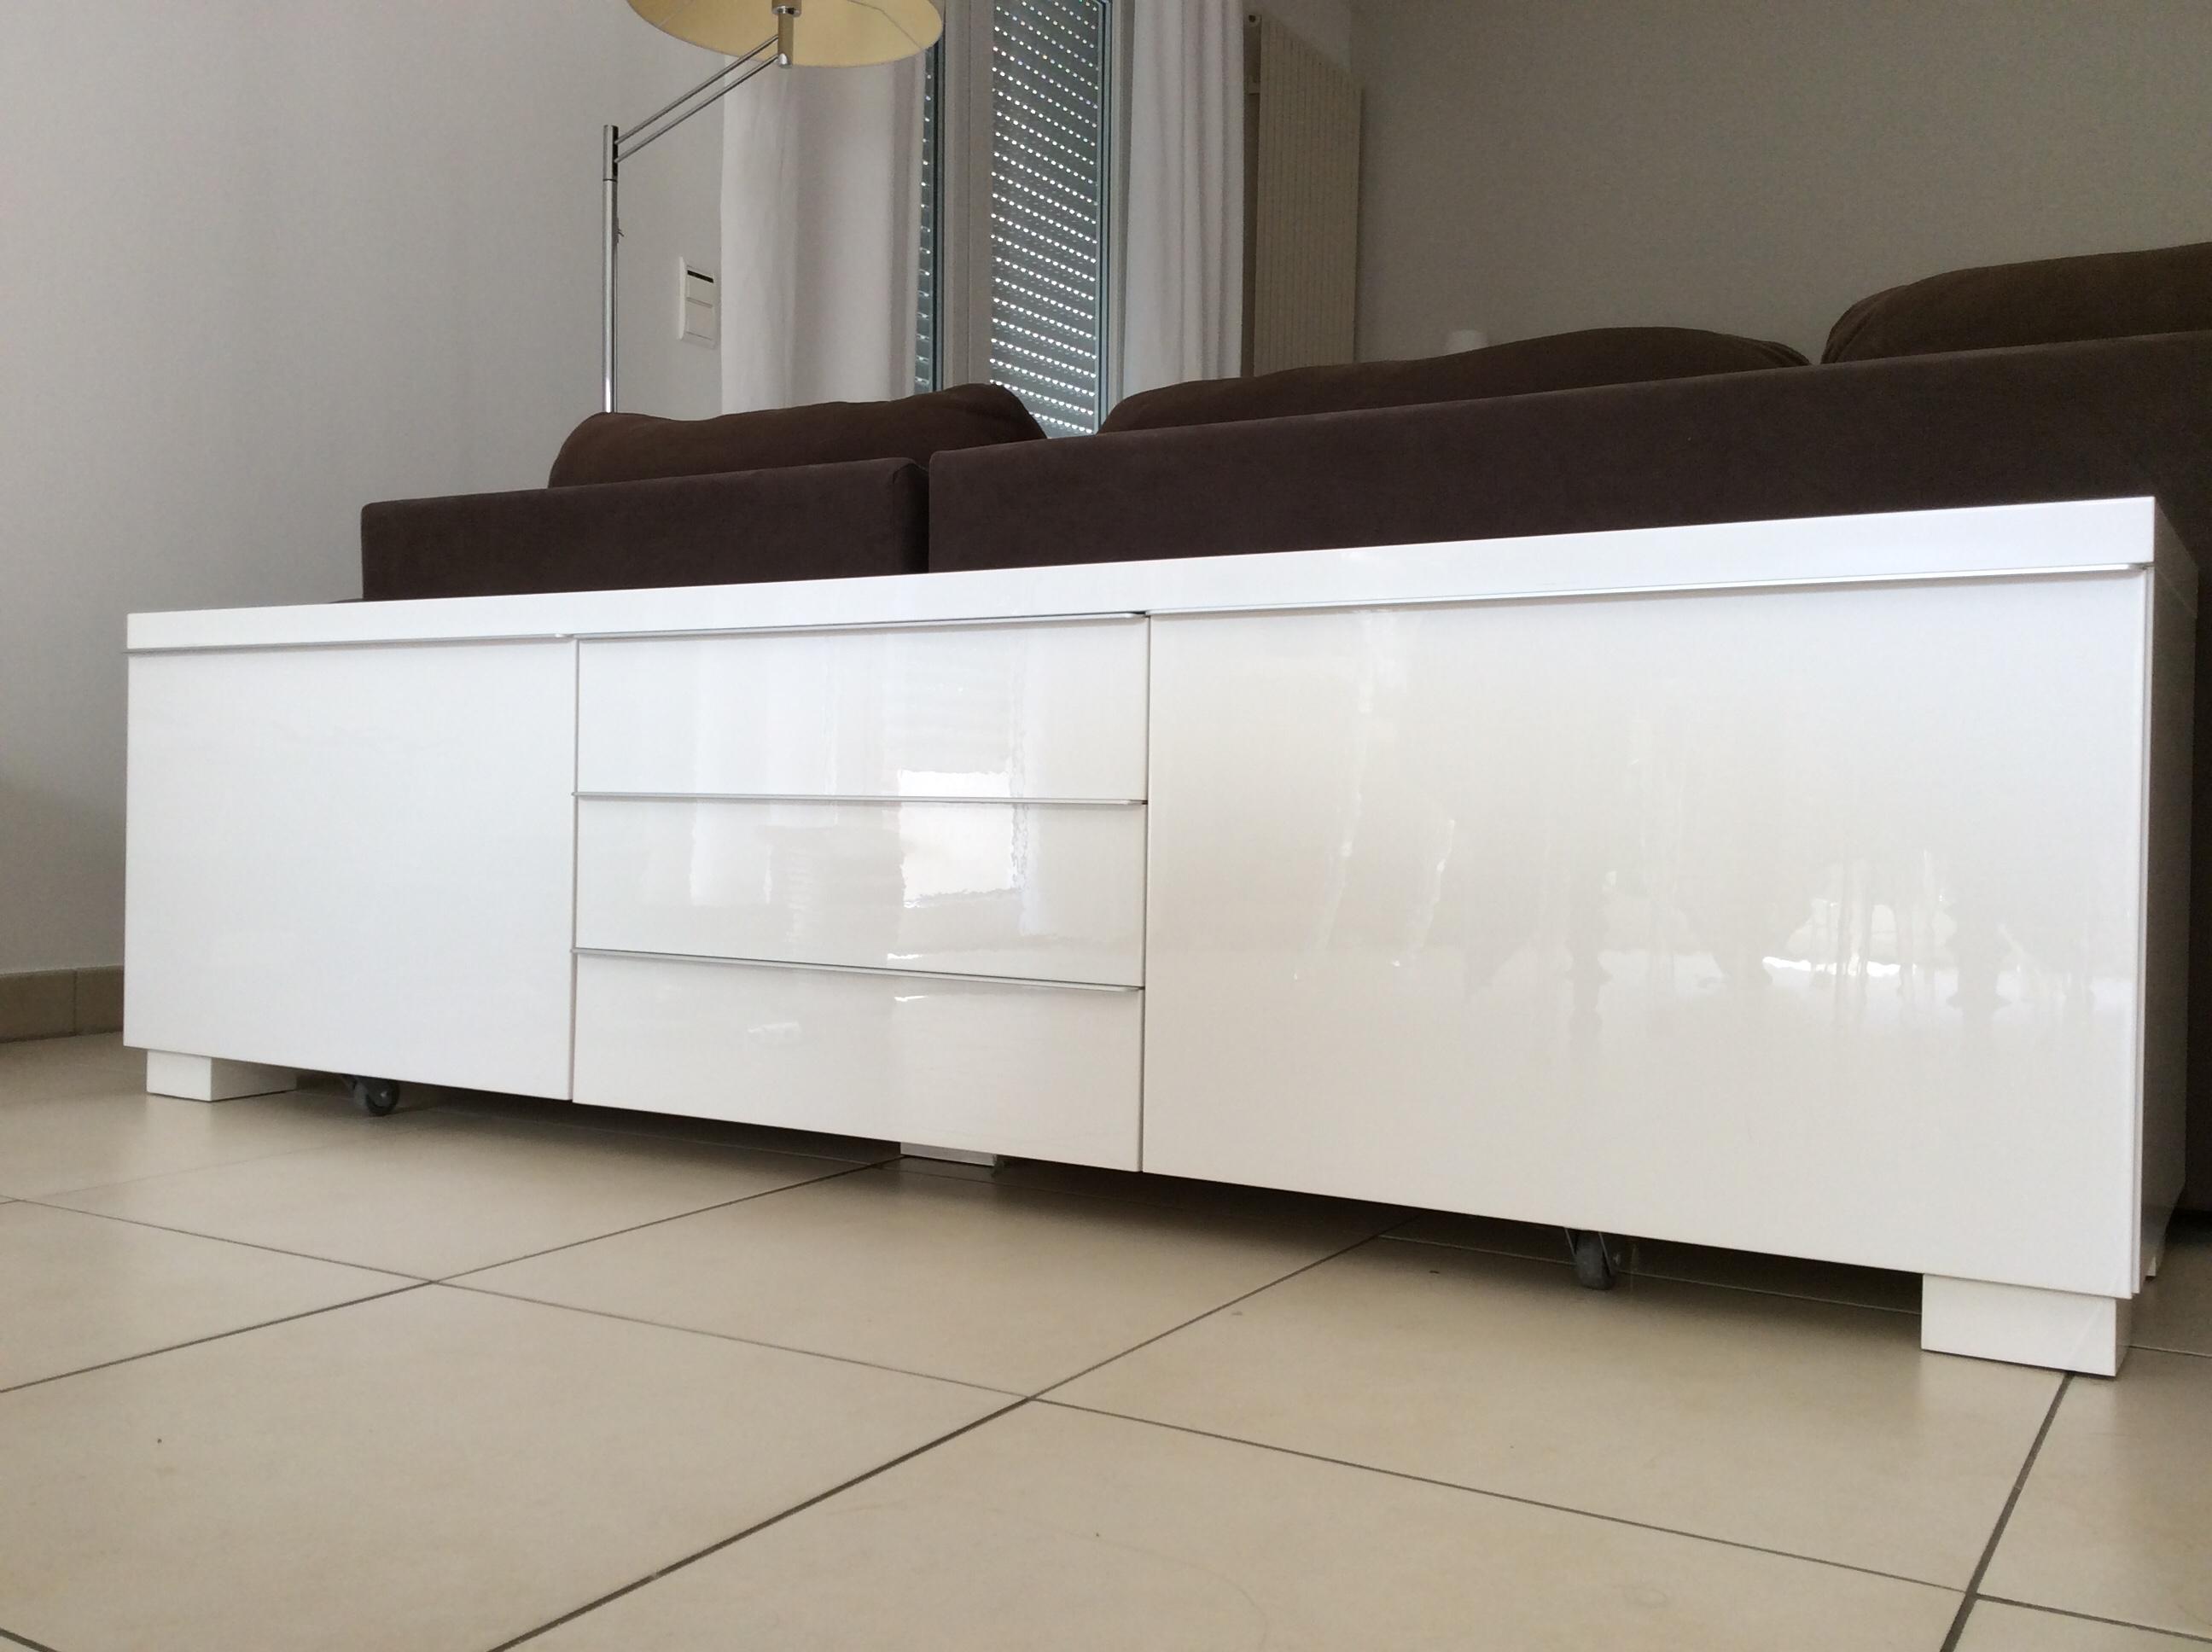 Ikea Meuble Blanc Laqué meuble ikéa tv besta burs laqué blanc